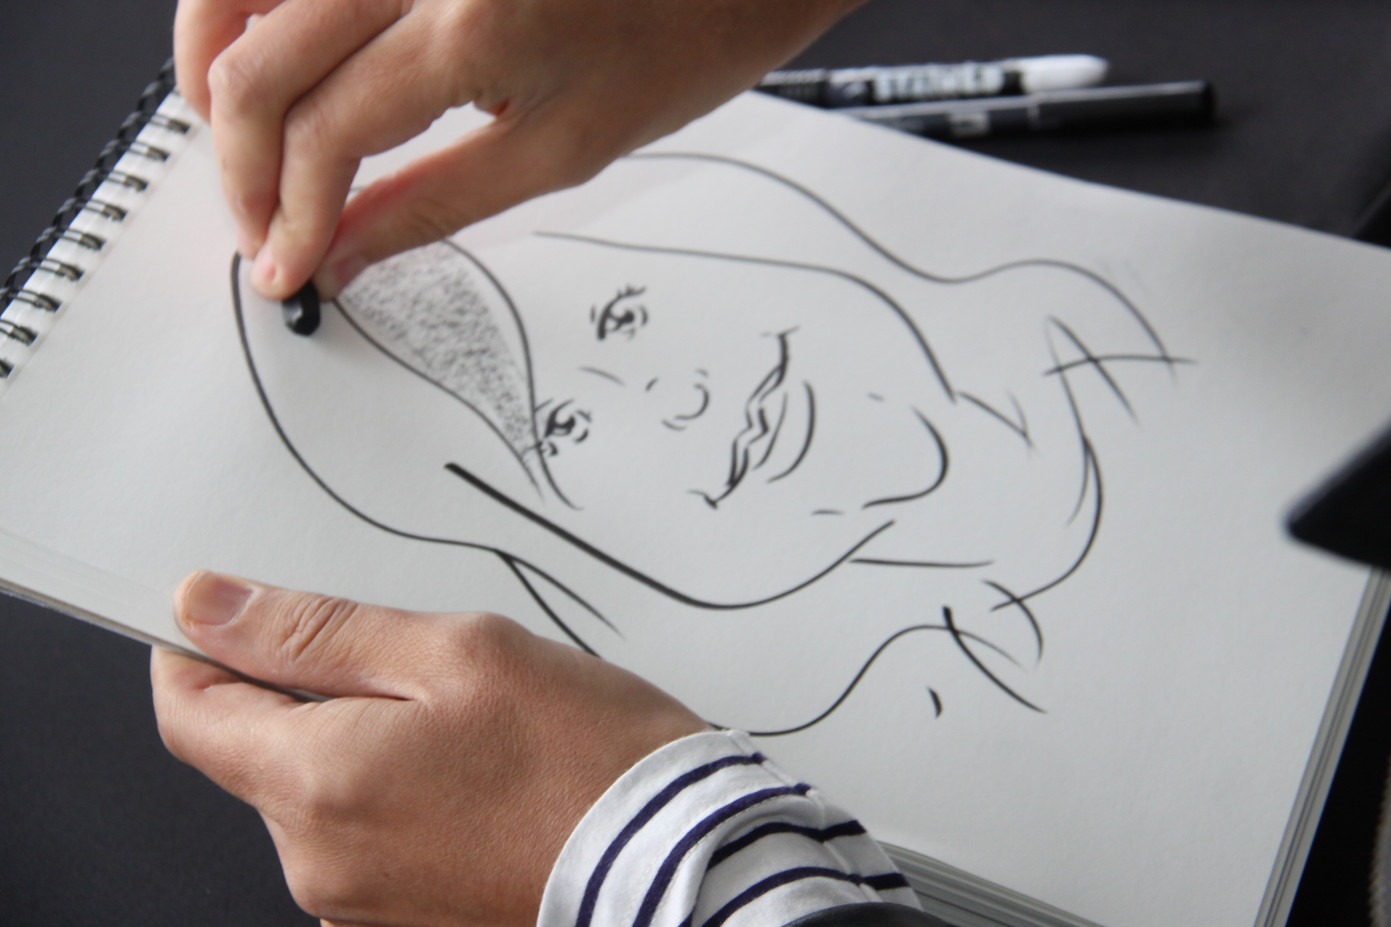 Caricaturist-Woman's-Drawing.JPG